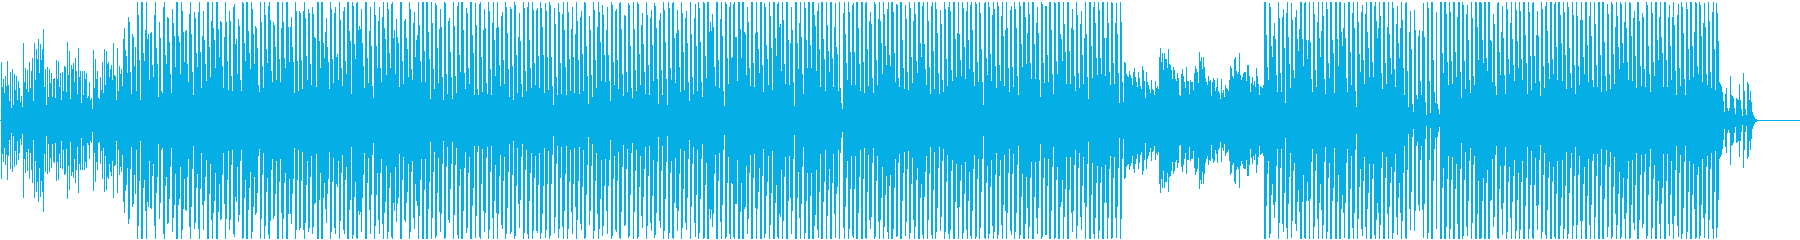 CMや映像に 企業系パワフルストリングスの再生済みの波形